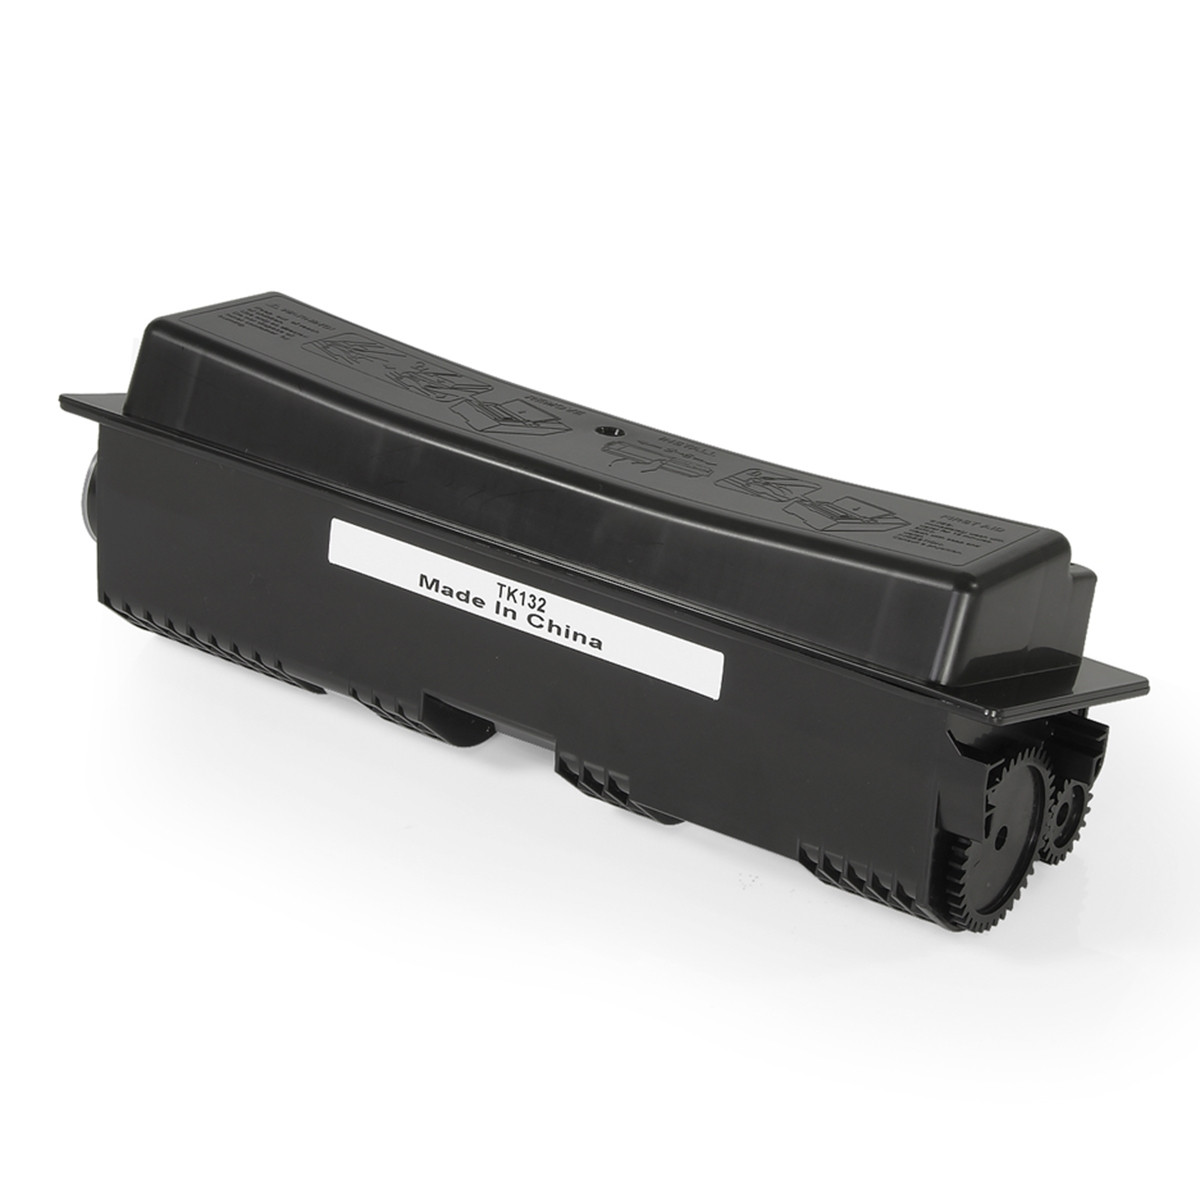 Toner Compatível com Kyocera TK137 TK-137   FS1100 FS-1100   Importado 7k